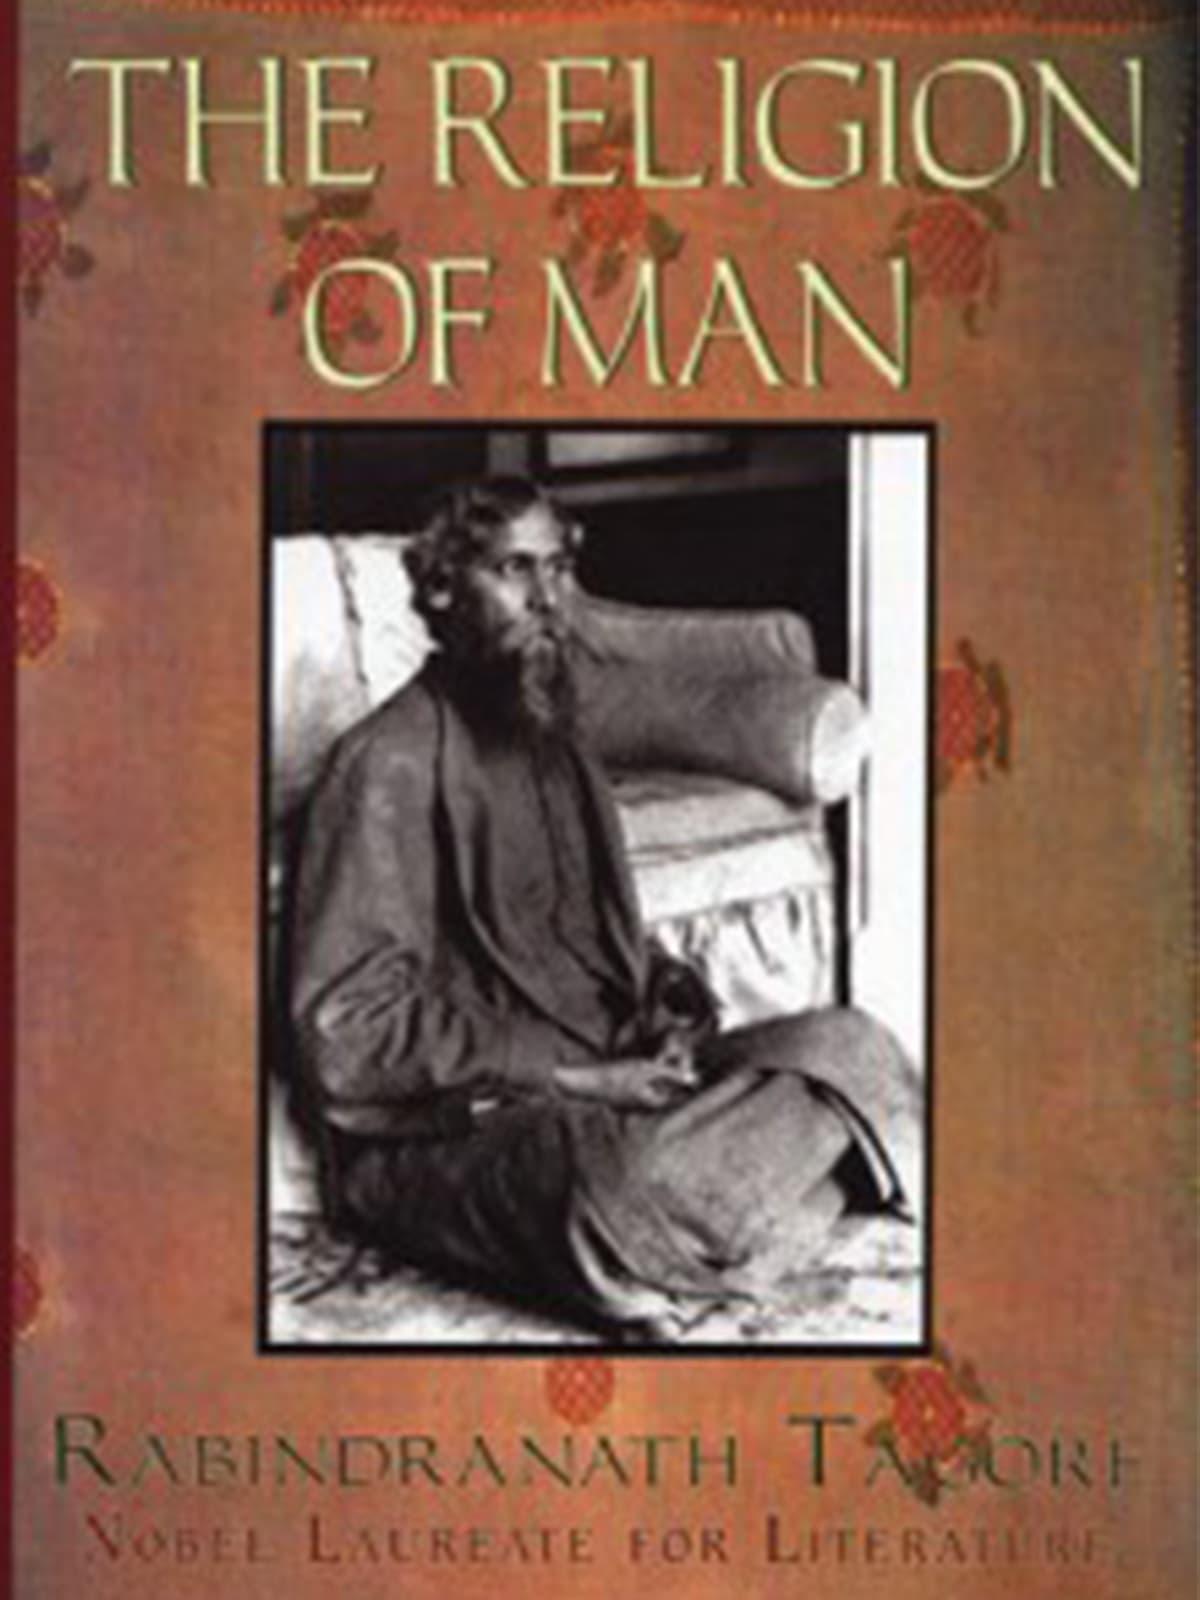 Rabindranath Tagore *The Religion of Man*